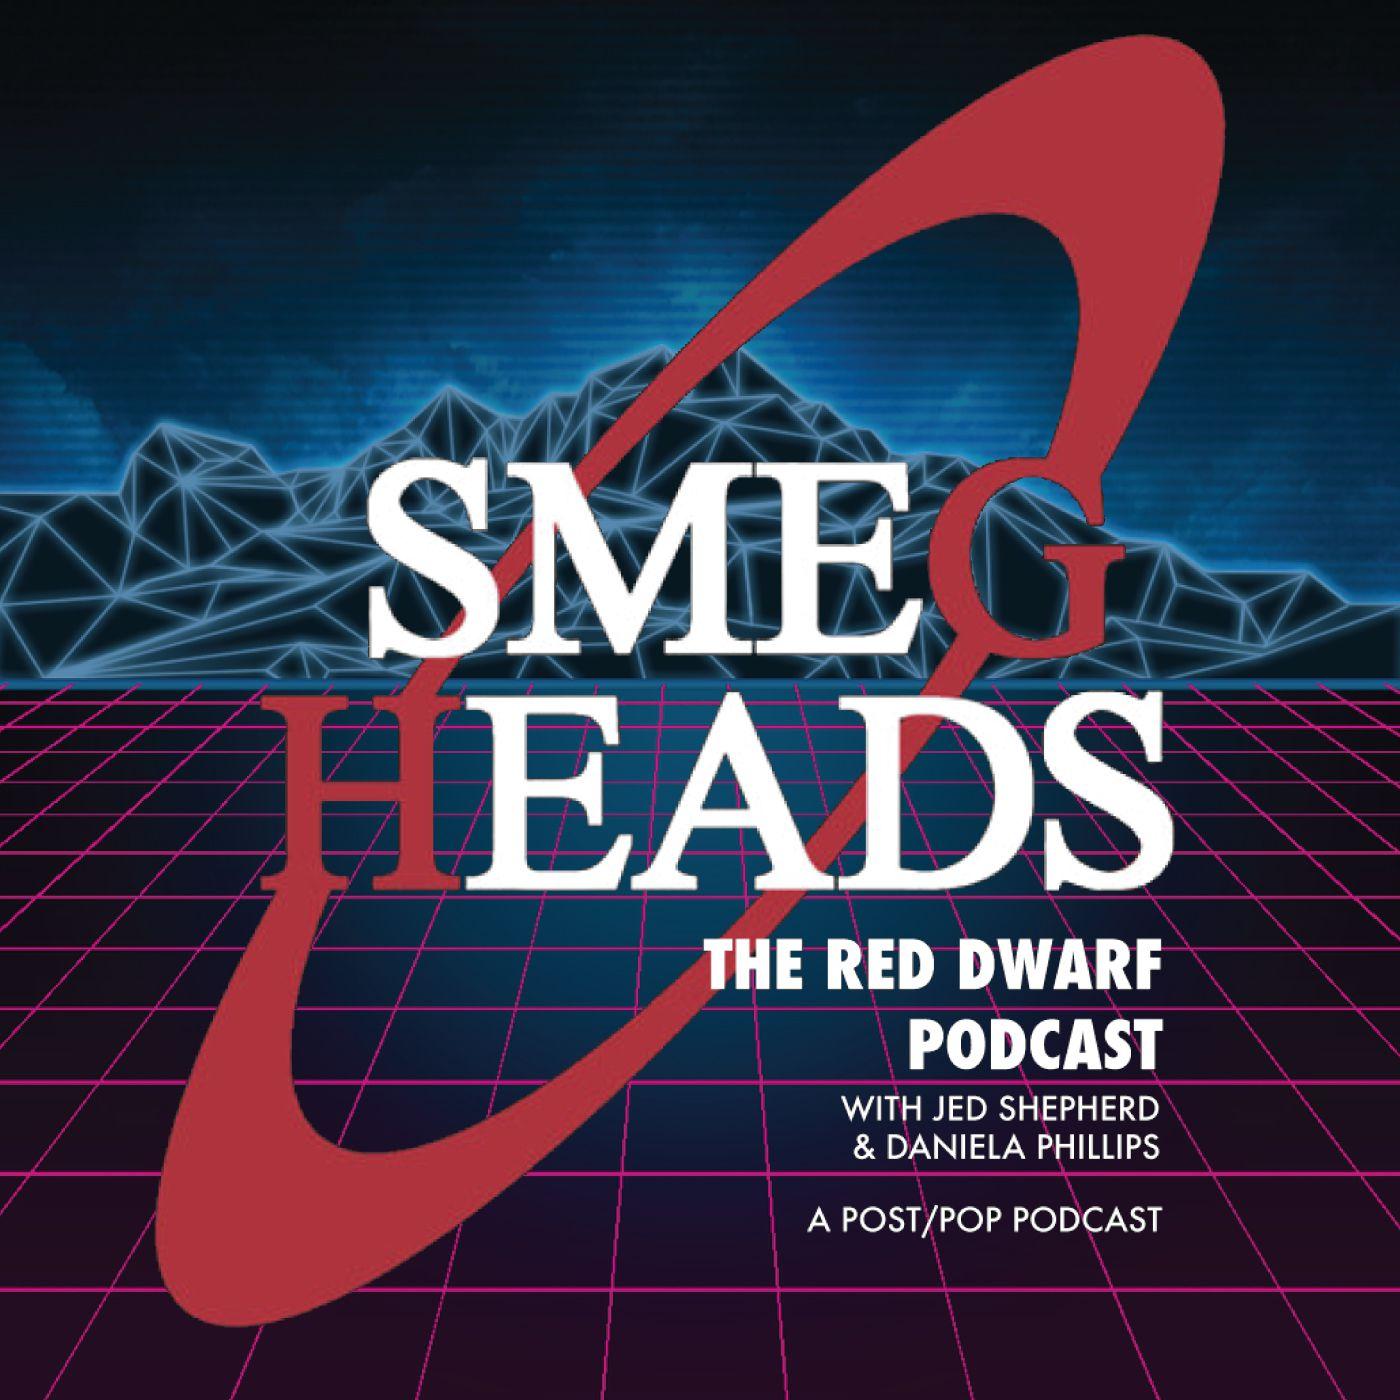 smegheads logo.jpg